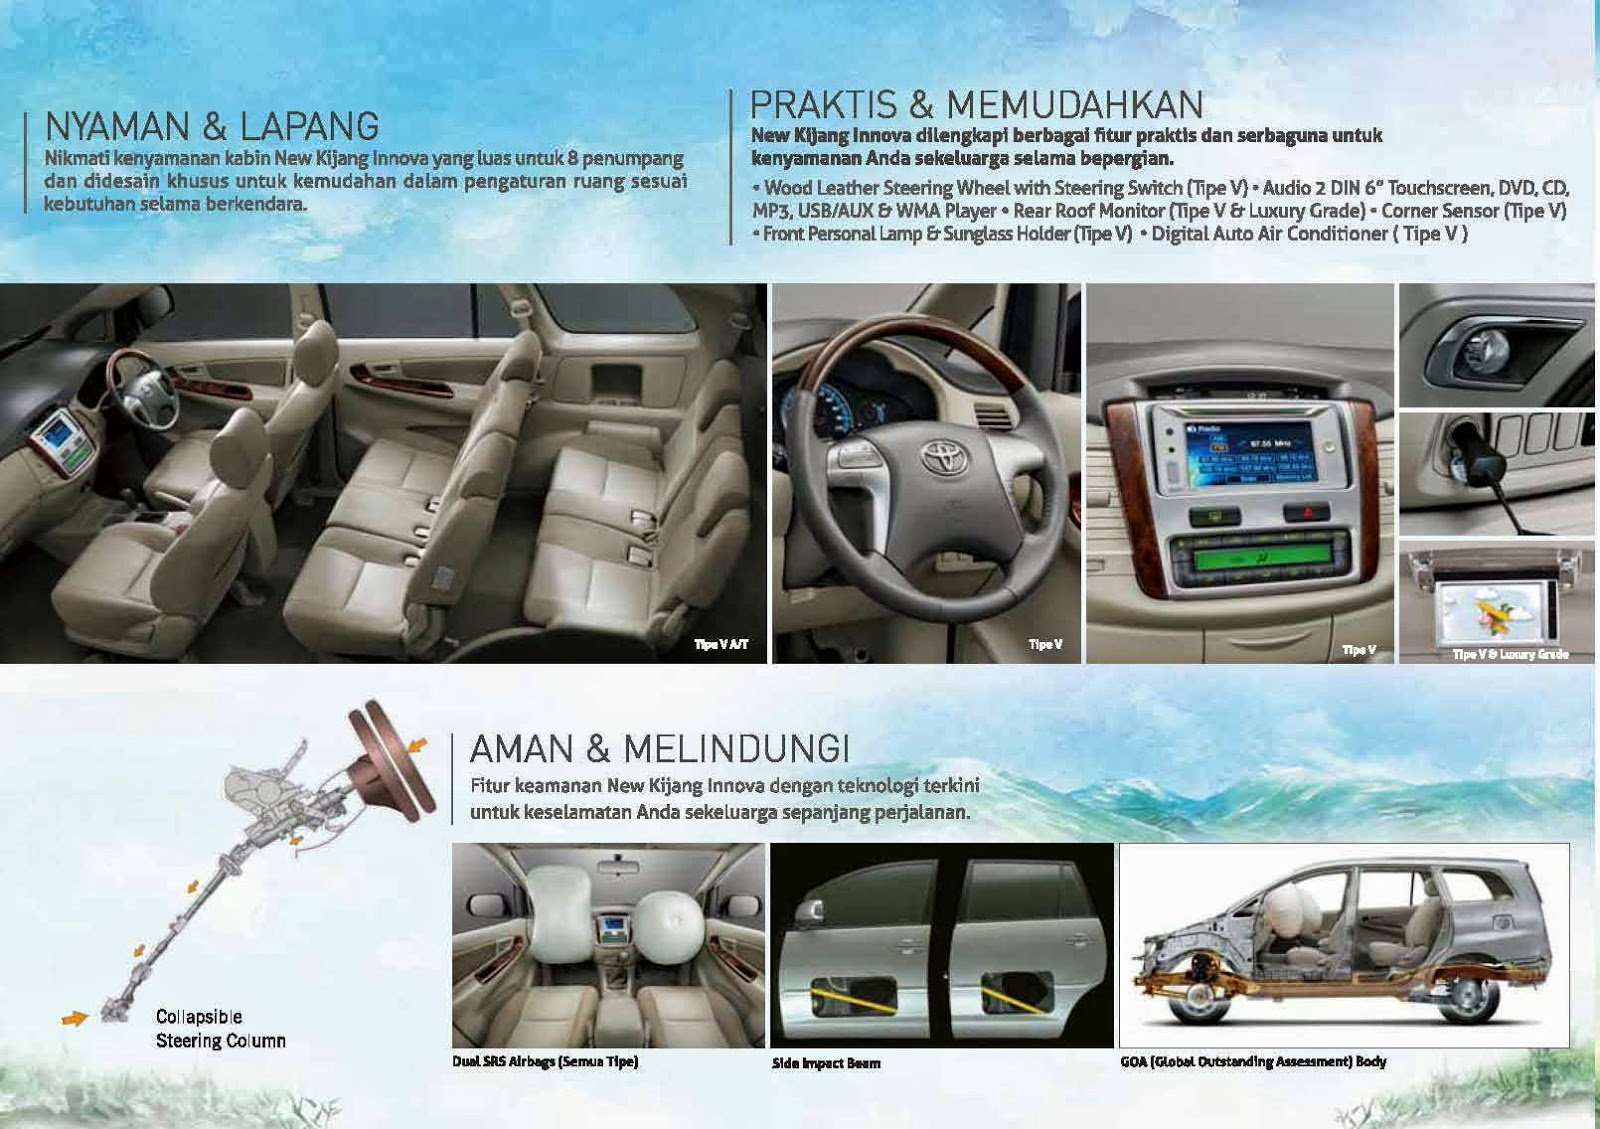 Spesifikasi Toyota All New Kijang Innova Jual Camry Brosur 2016 Grill Harga